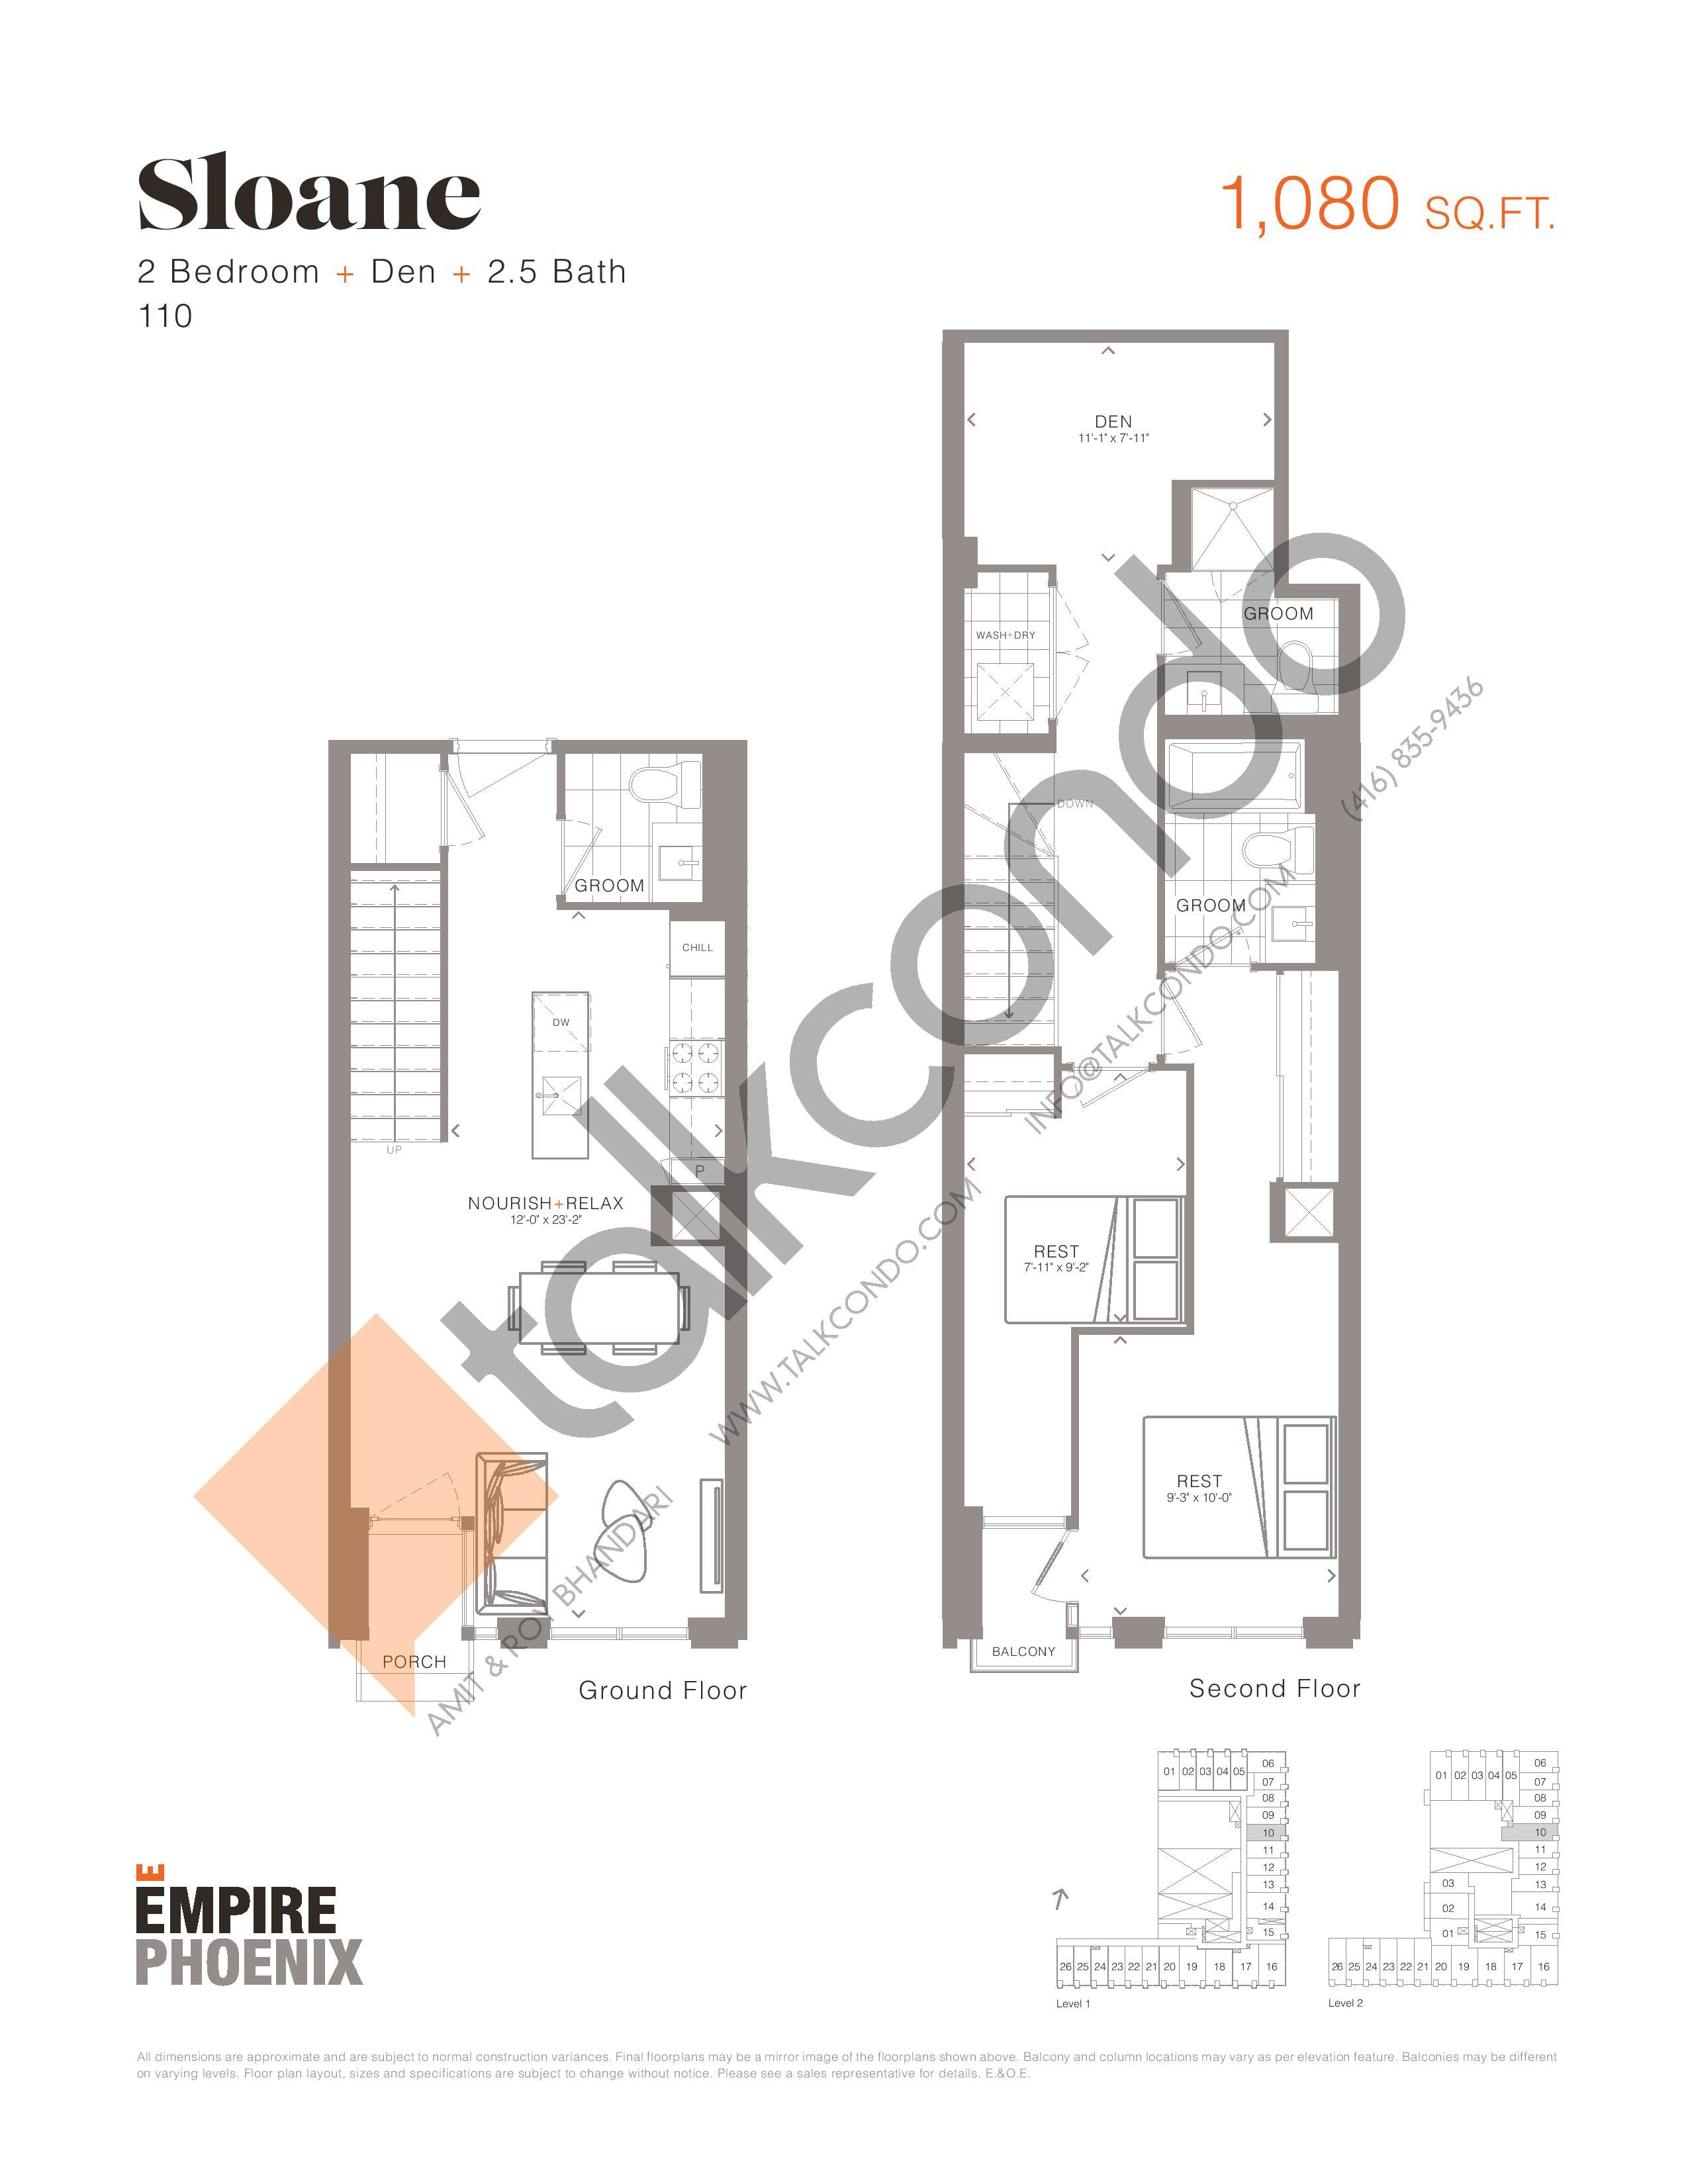 Sloane - Garden Suites Floor Plan at Empire Phoenix Condos - 1080 sq.ft